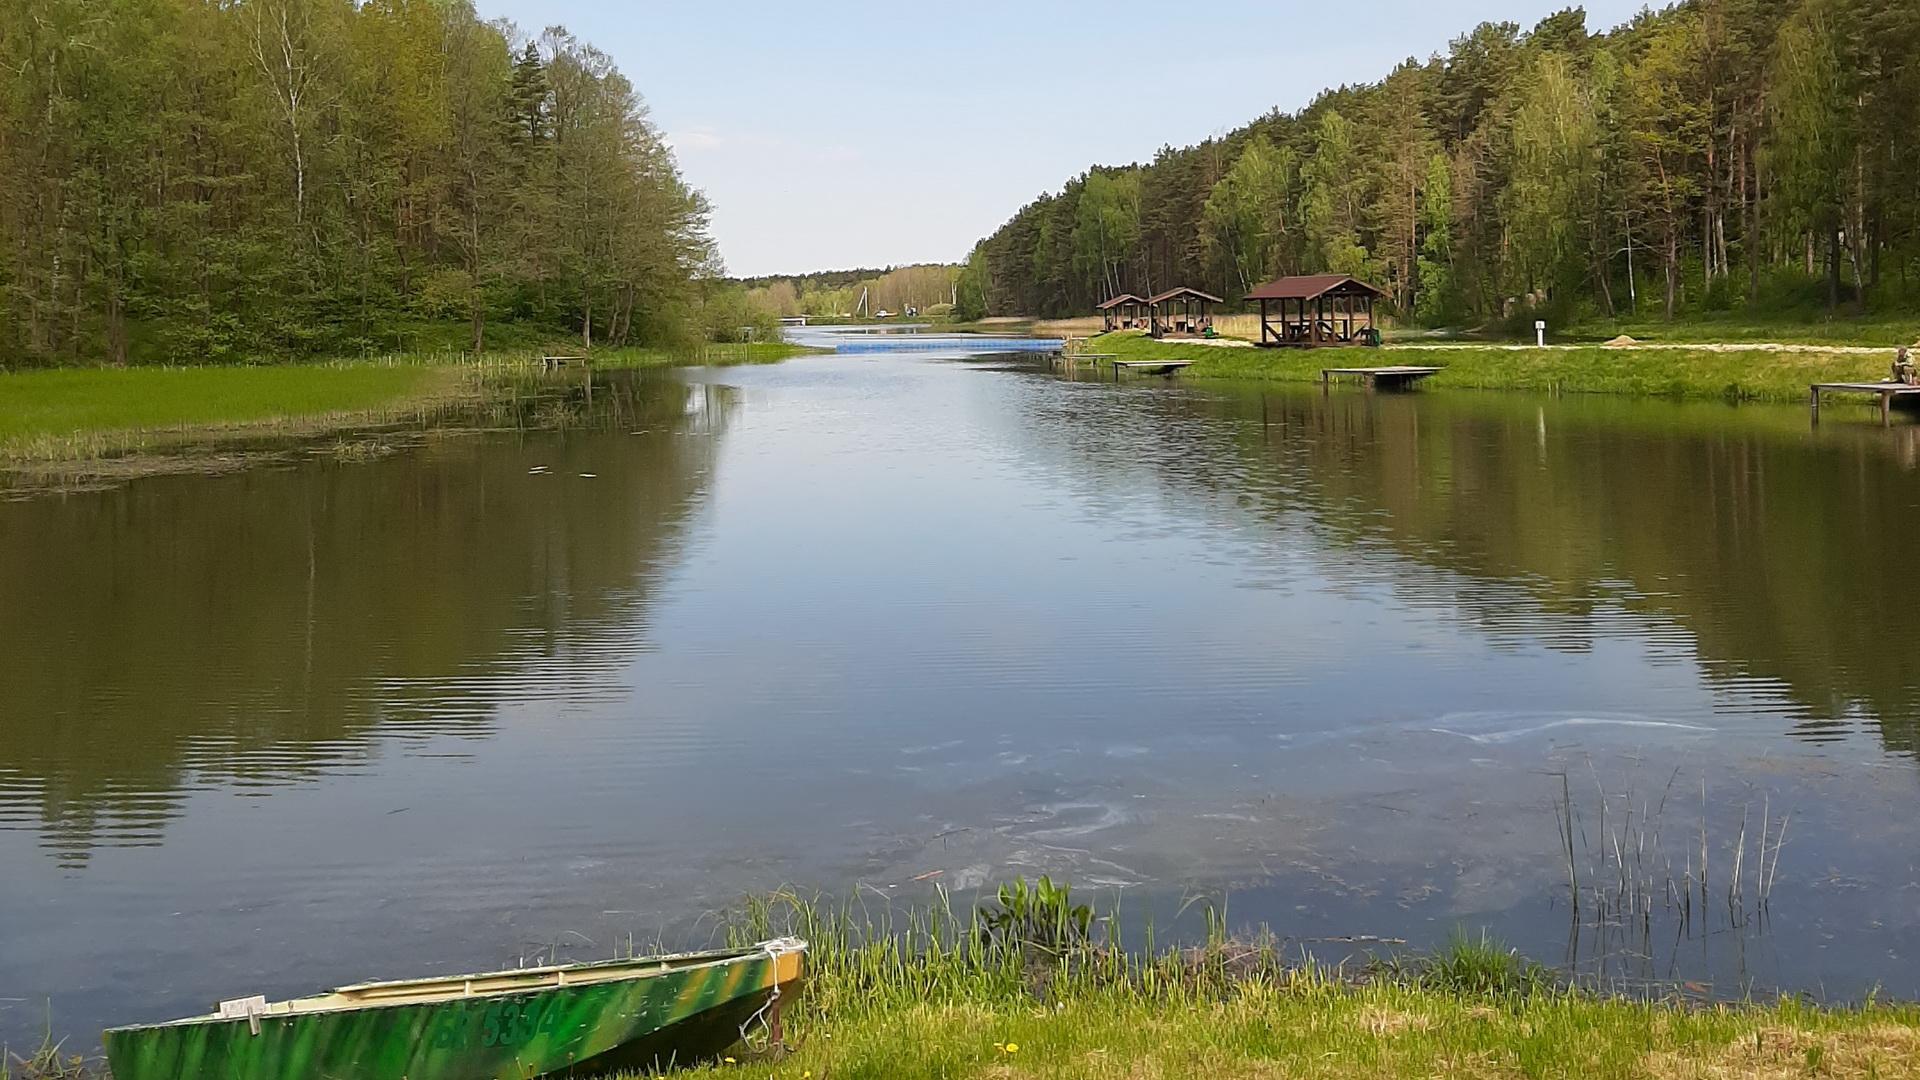 Бермуды - уютныйВчера посетил платник Бермуды. 50 км ... | Отчеты о рыбалке в Беларуси